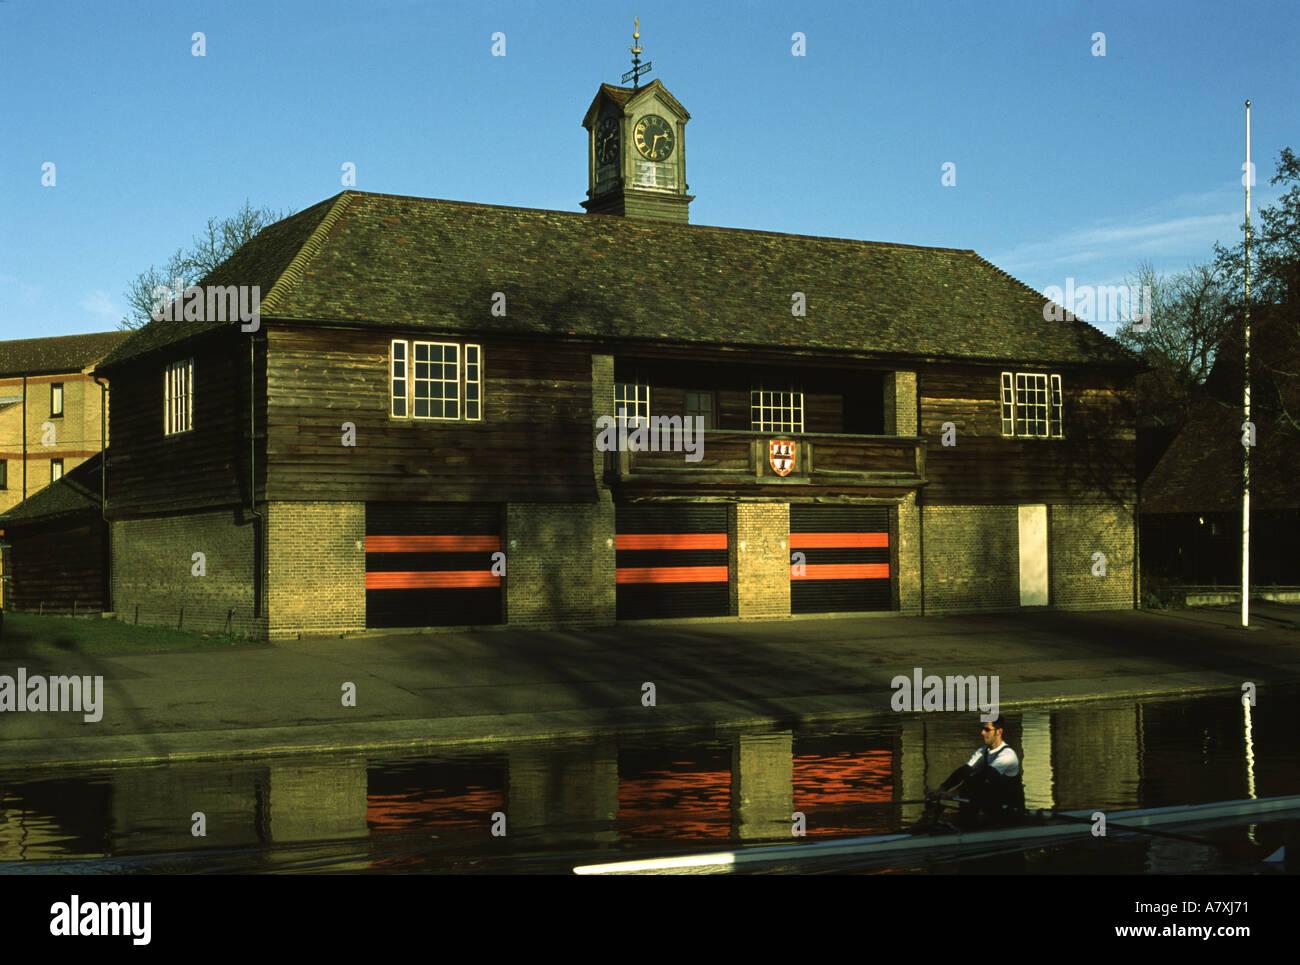 Jesus College Boathouse - Stock Image